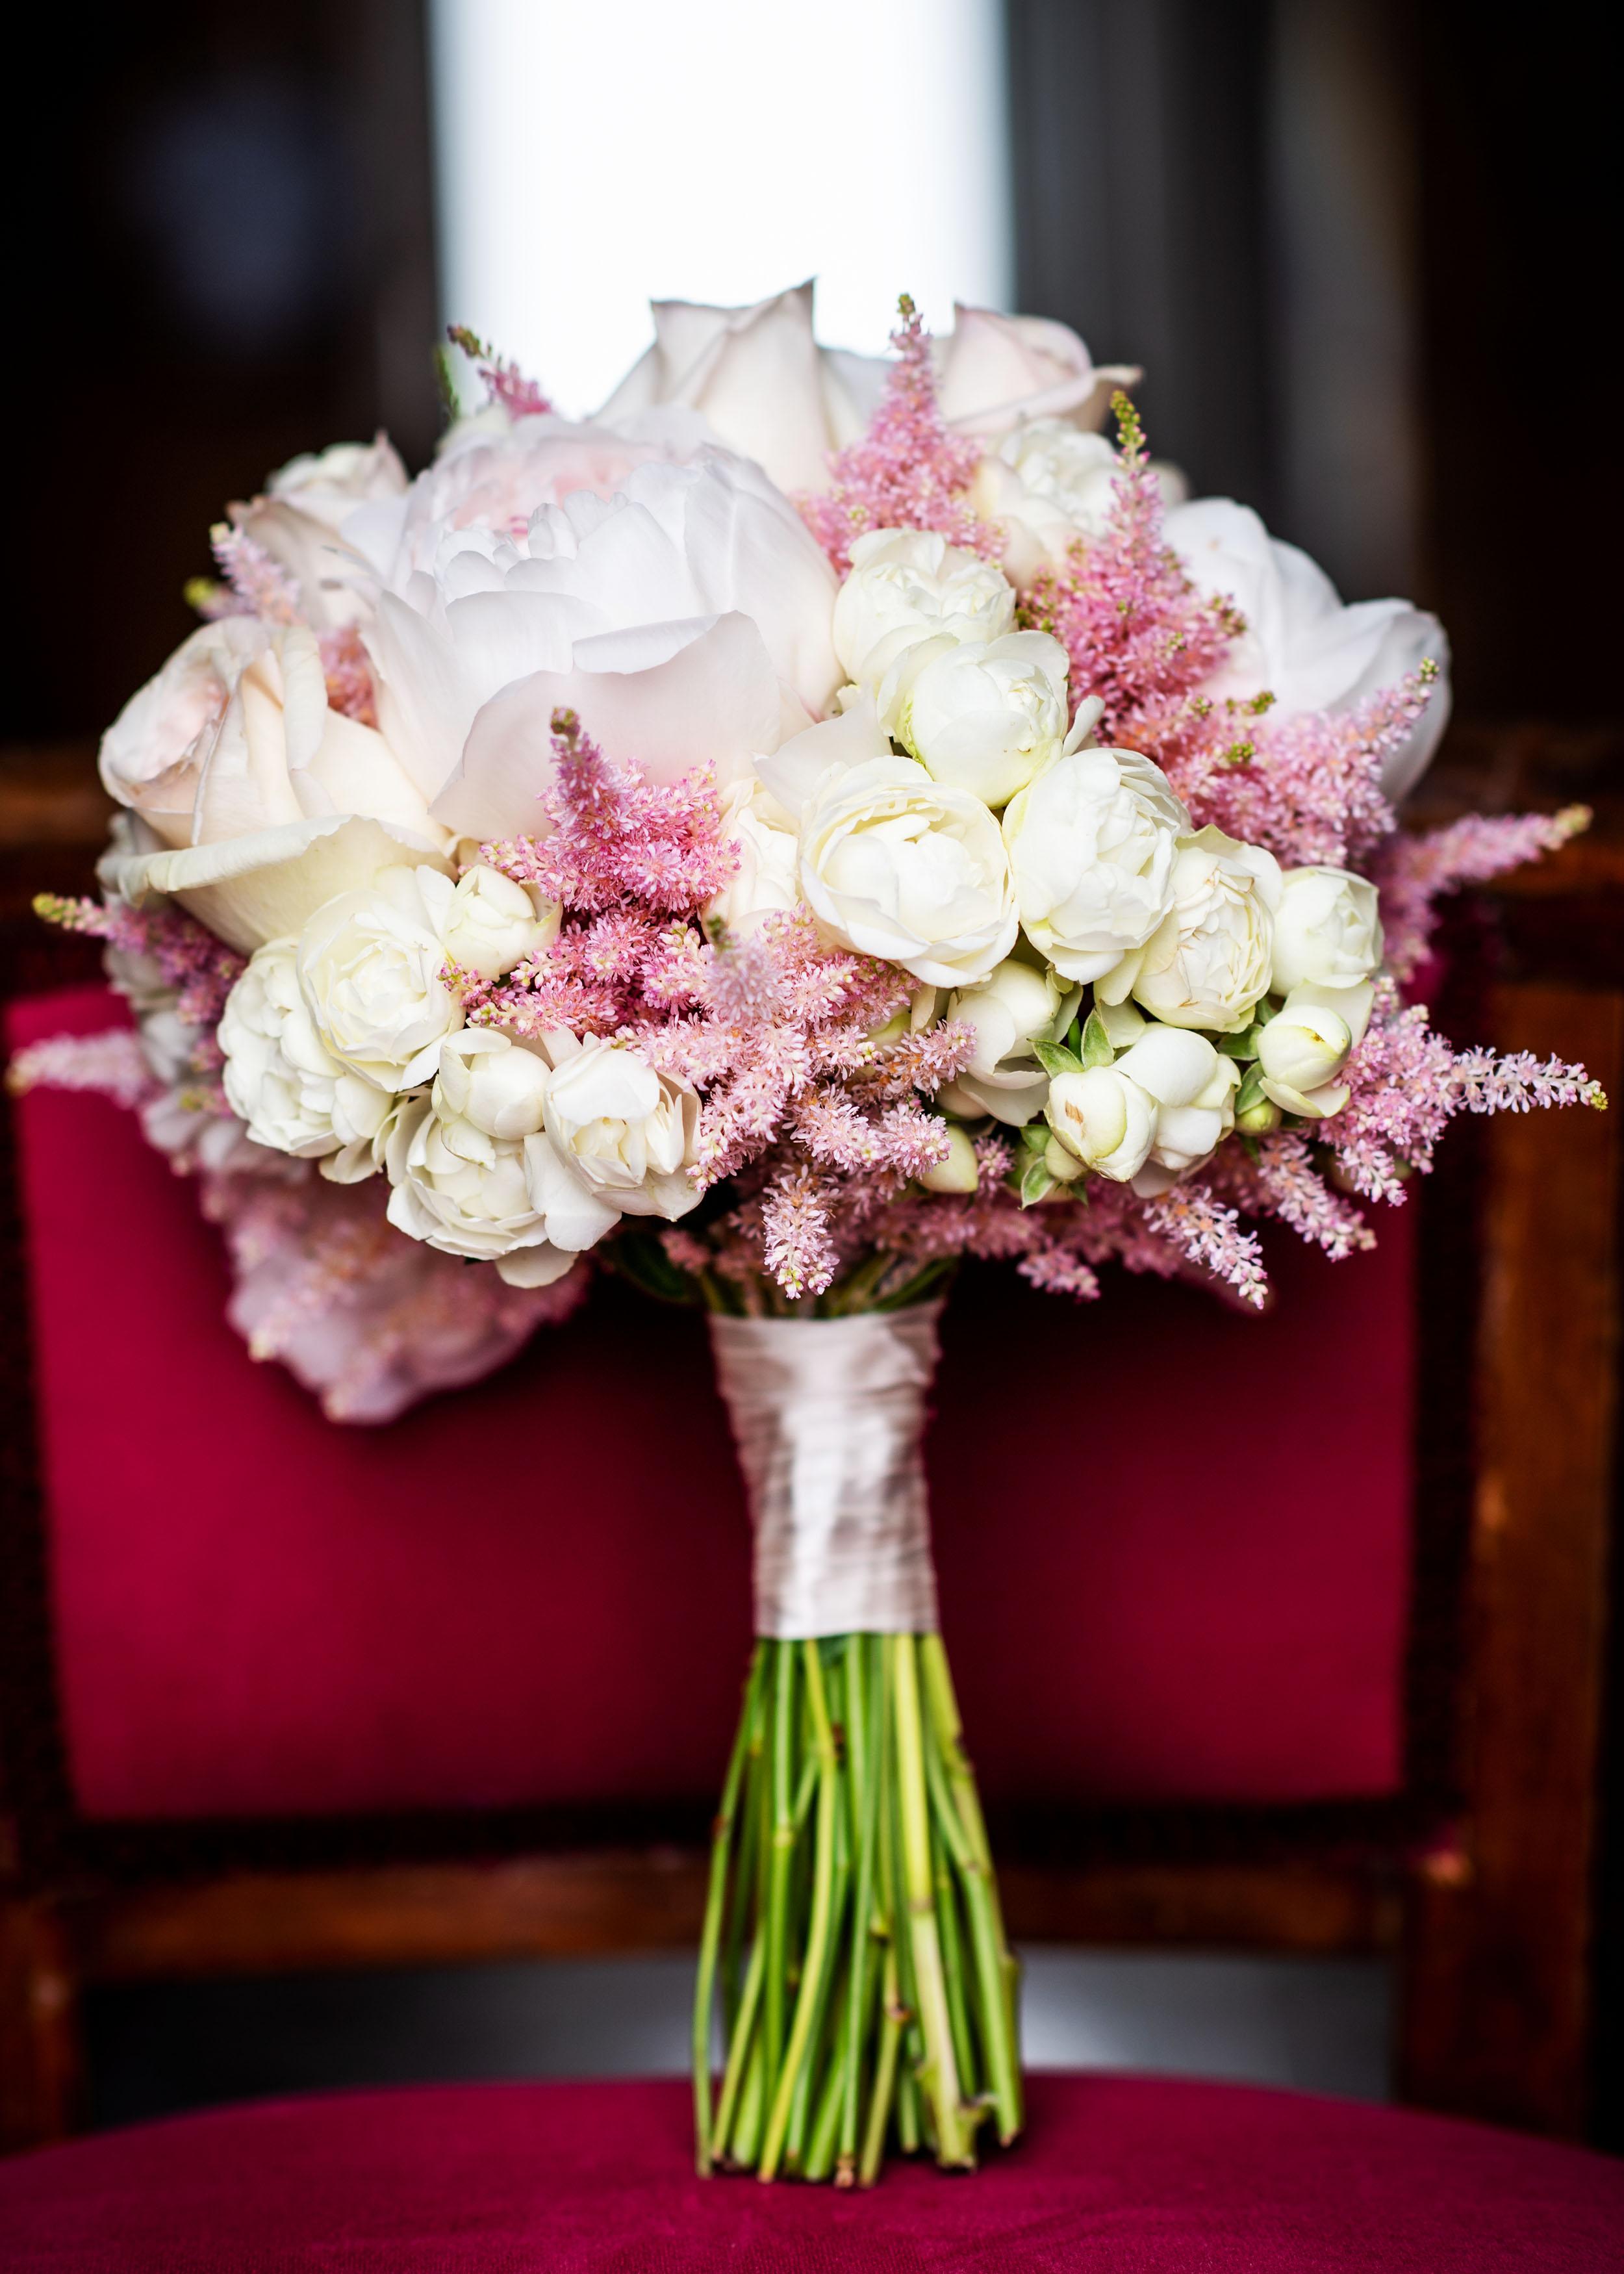 https://www.weddingamalfi.com/wp-content/uploads/Katia-Jorge-18-maggio-2019-19.jpg